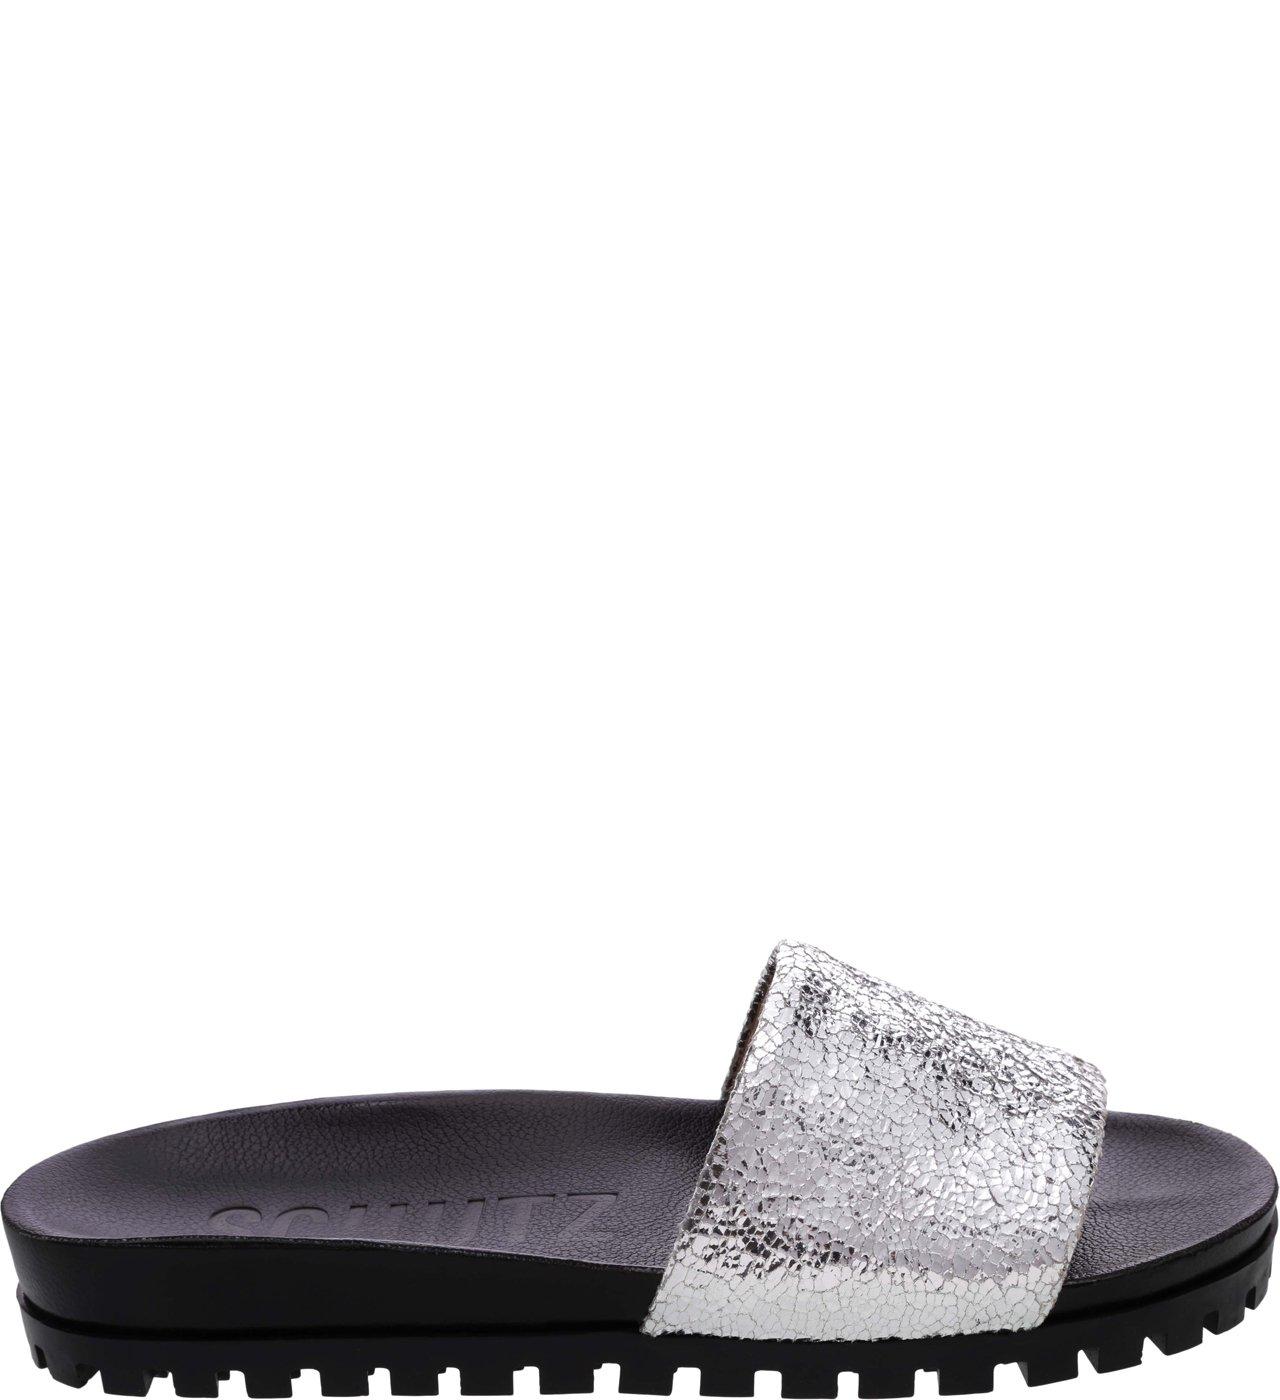 Flat Slide Sola Tratorada Silver   Schutz